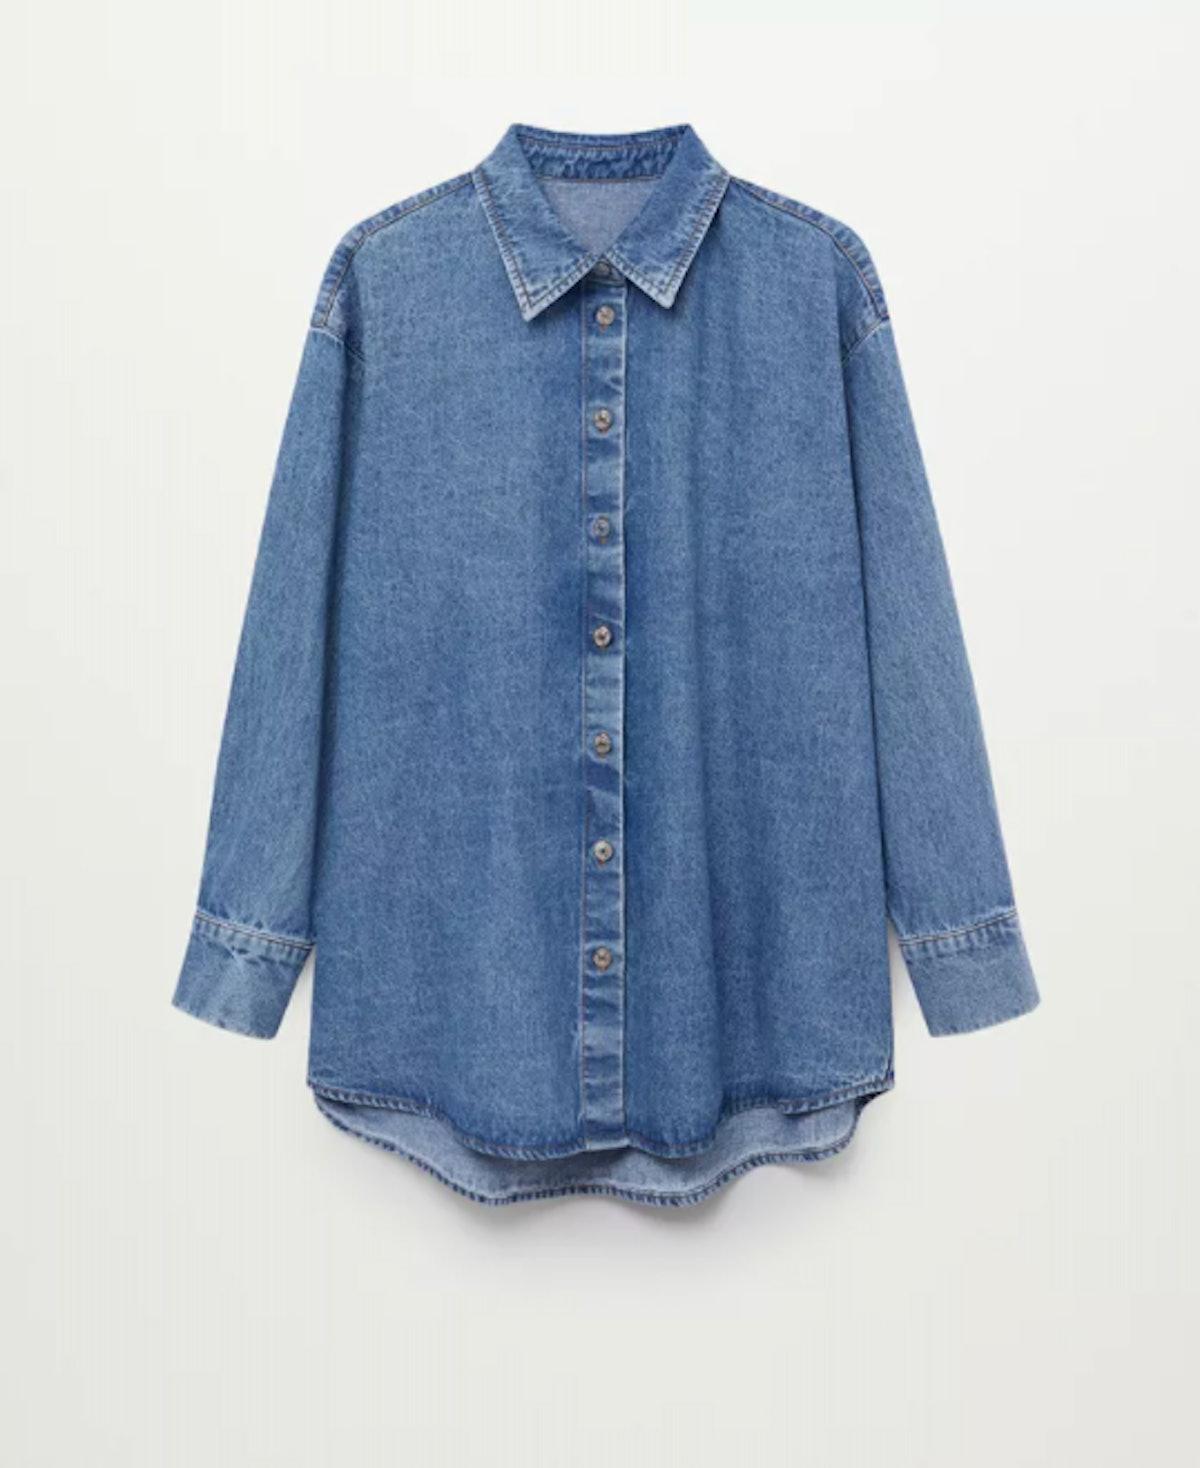 Oversize Denim Shirt In Medium Blue